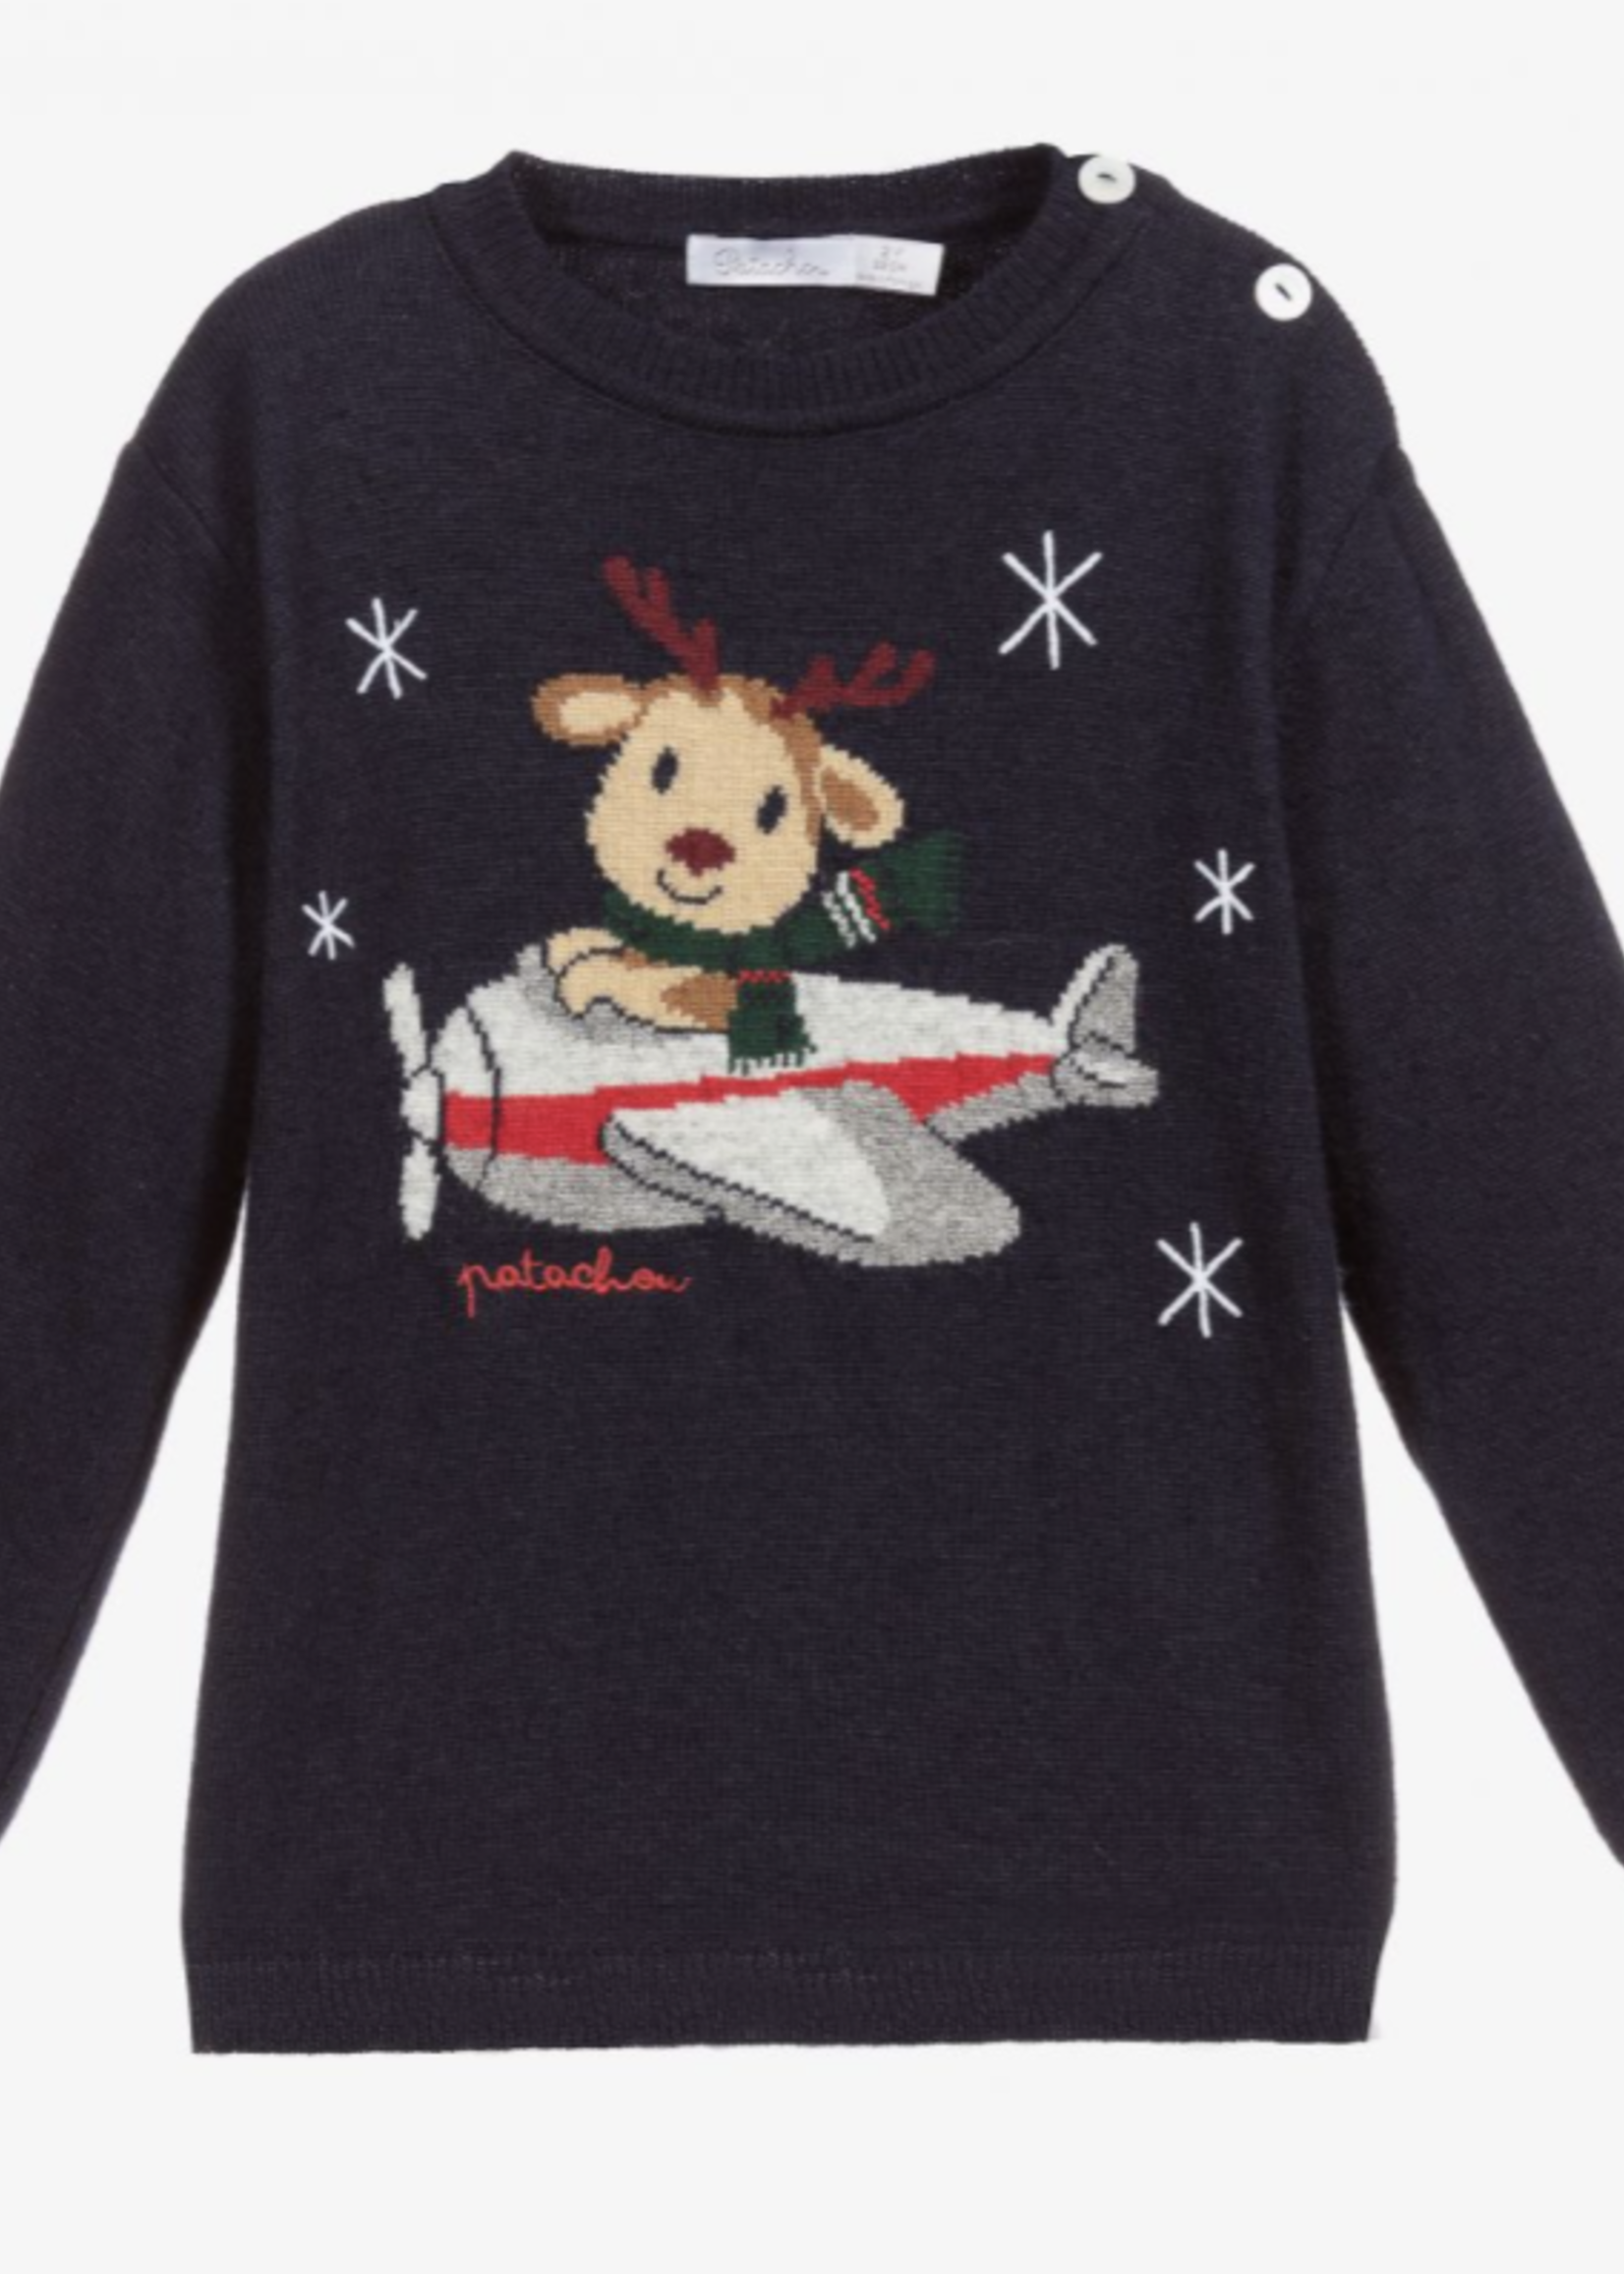 Patachou Patachou-AW21 3333350 Sweater